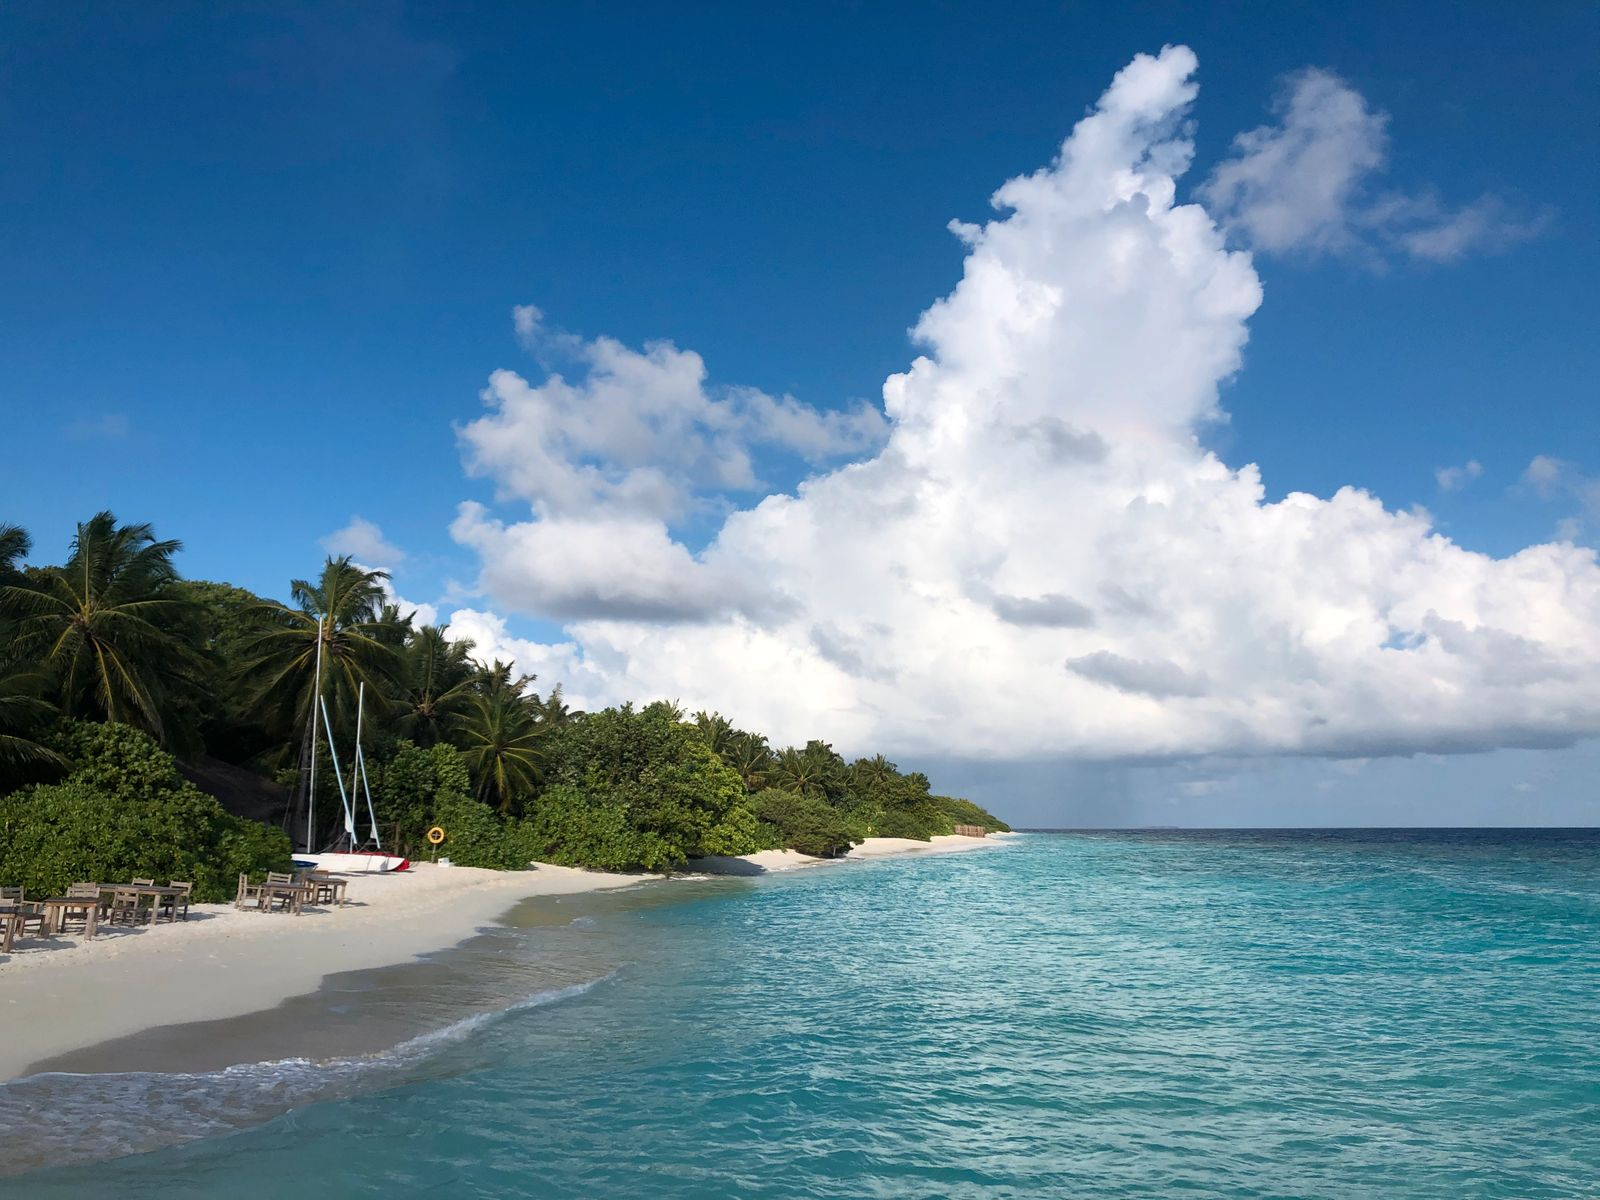 Island and Beach 3